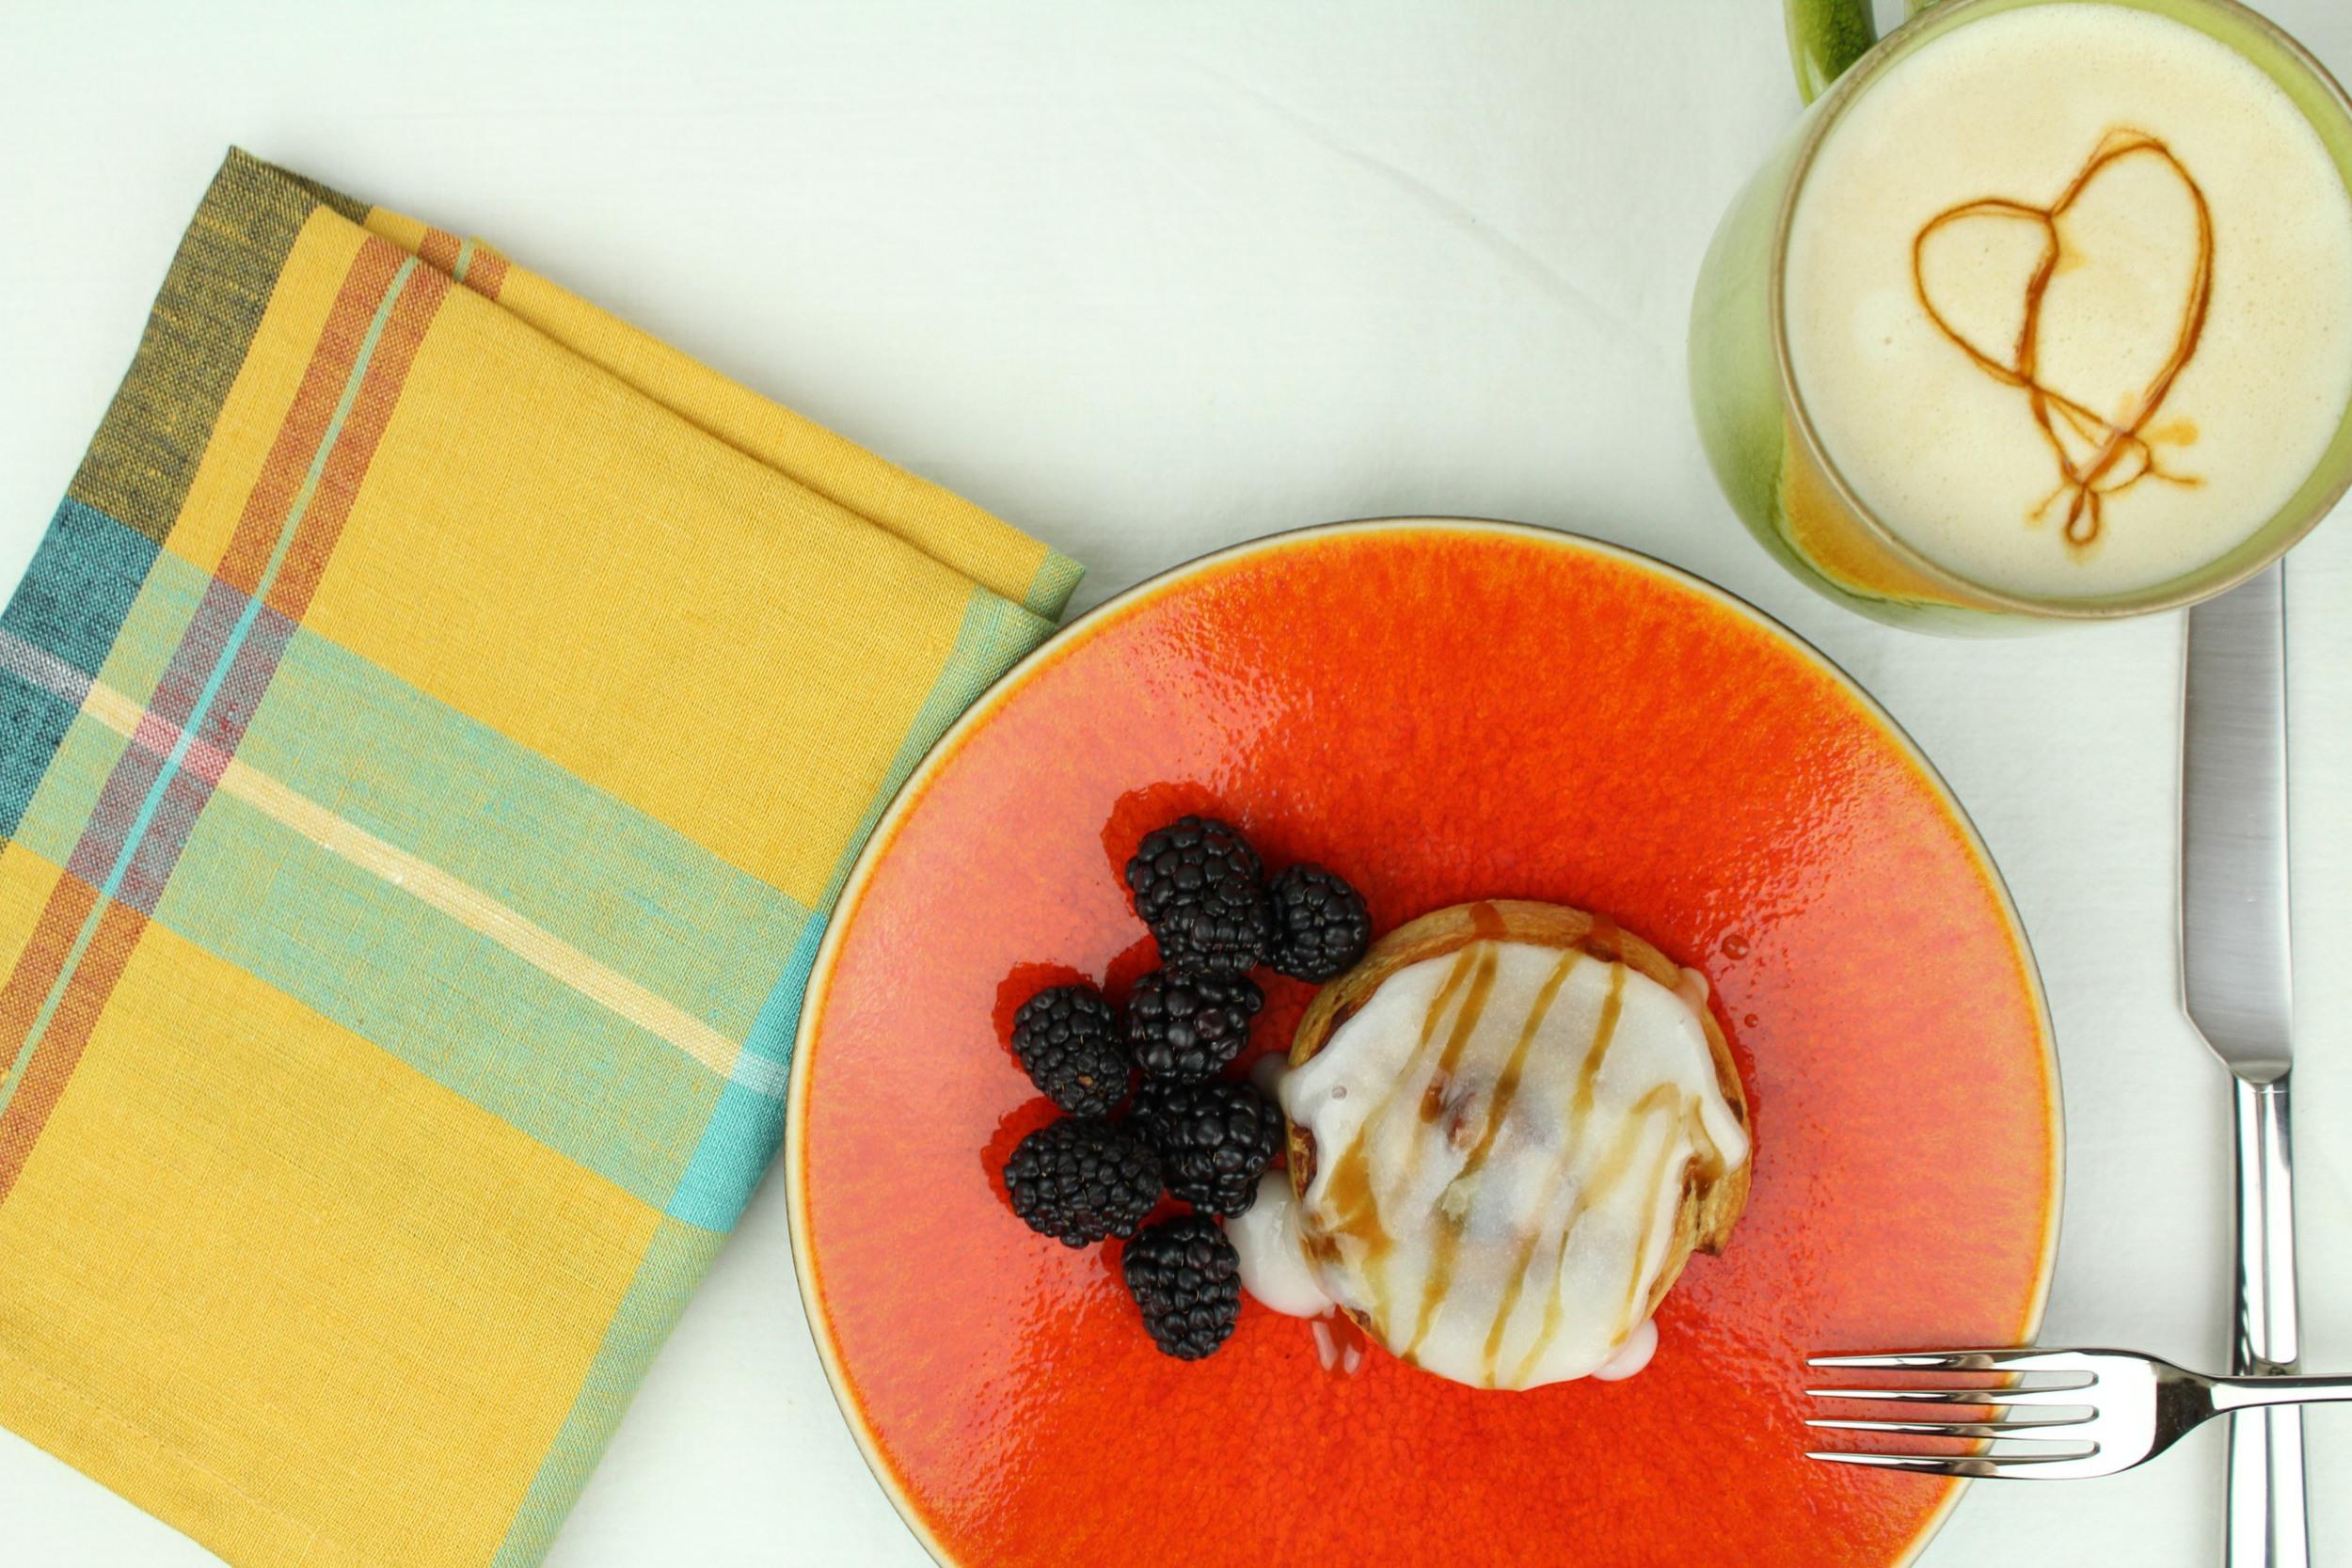 Libeco Indiana linen napkin ,  Jars Tourron dessert plate in Orange ,  Jars Tourron mug in Avocado ,  David Mellor Pride flatware